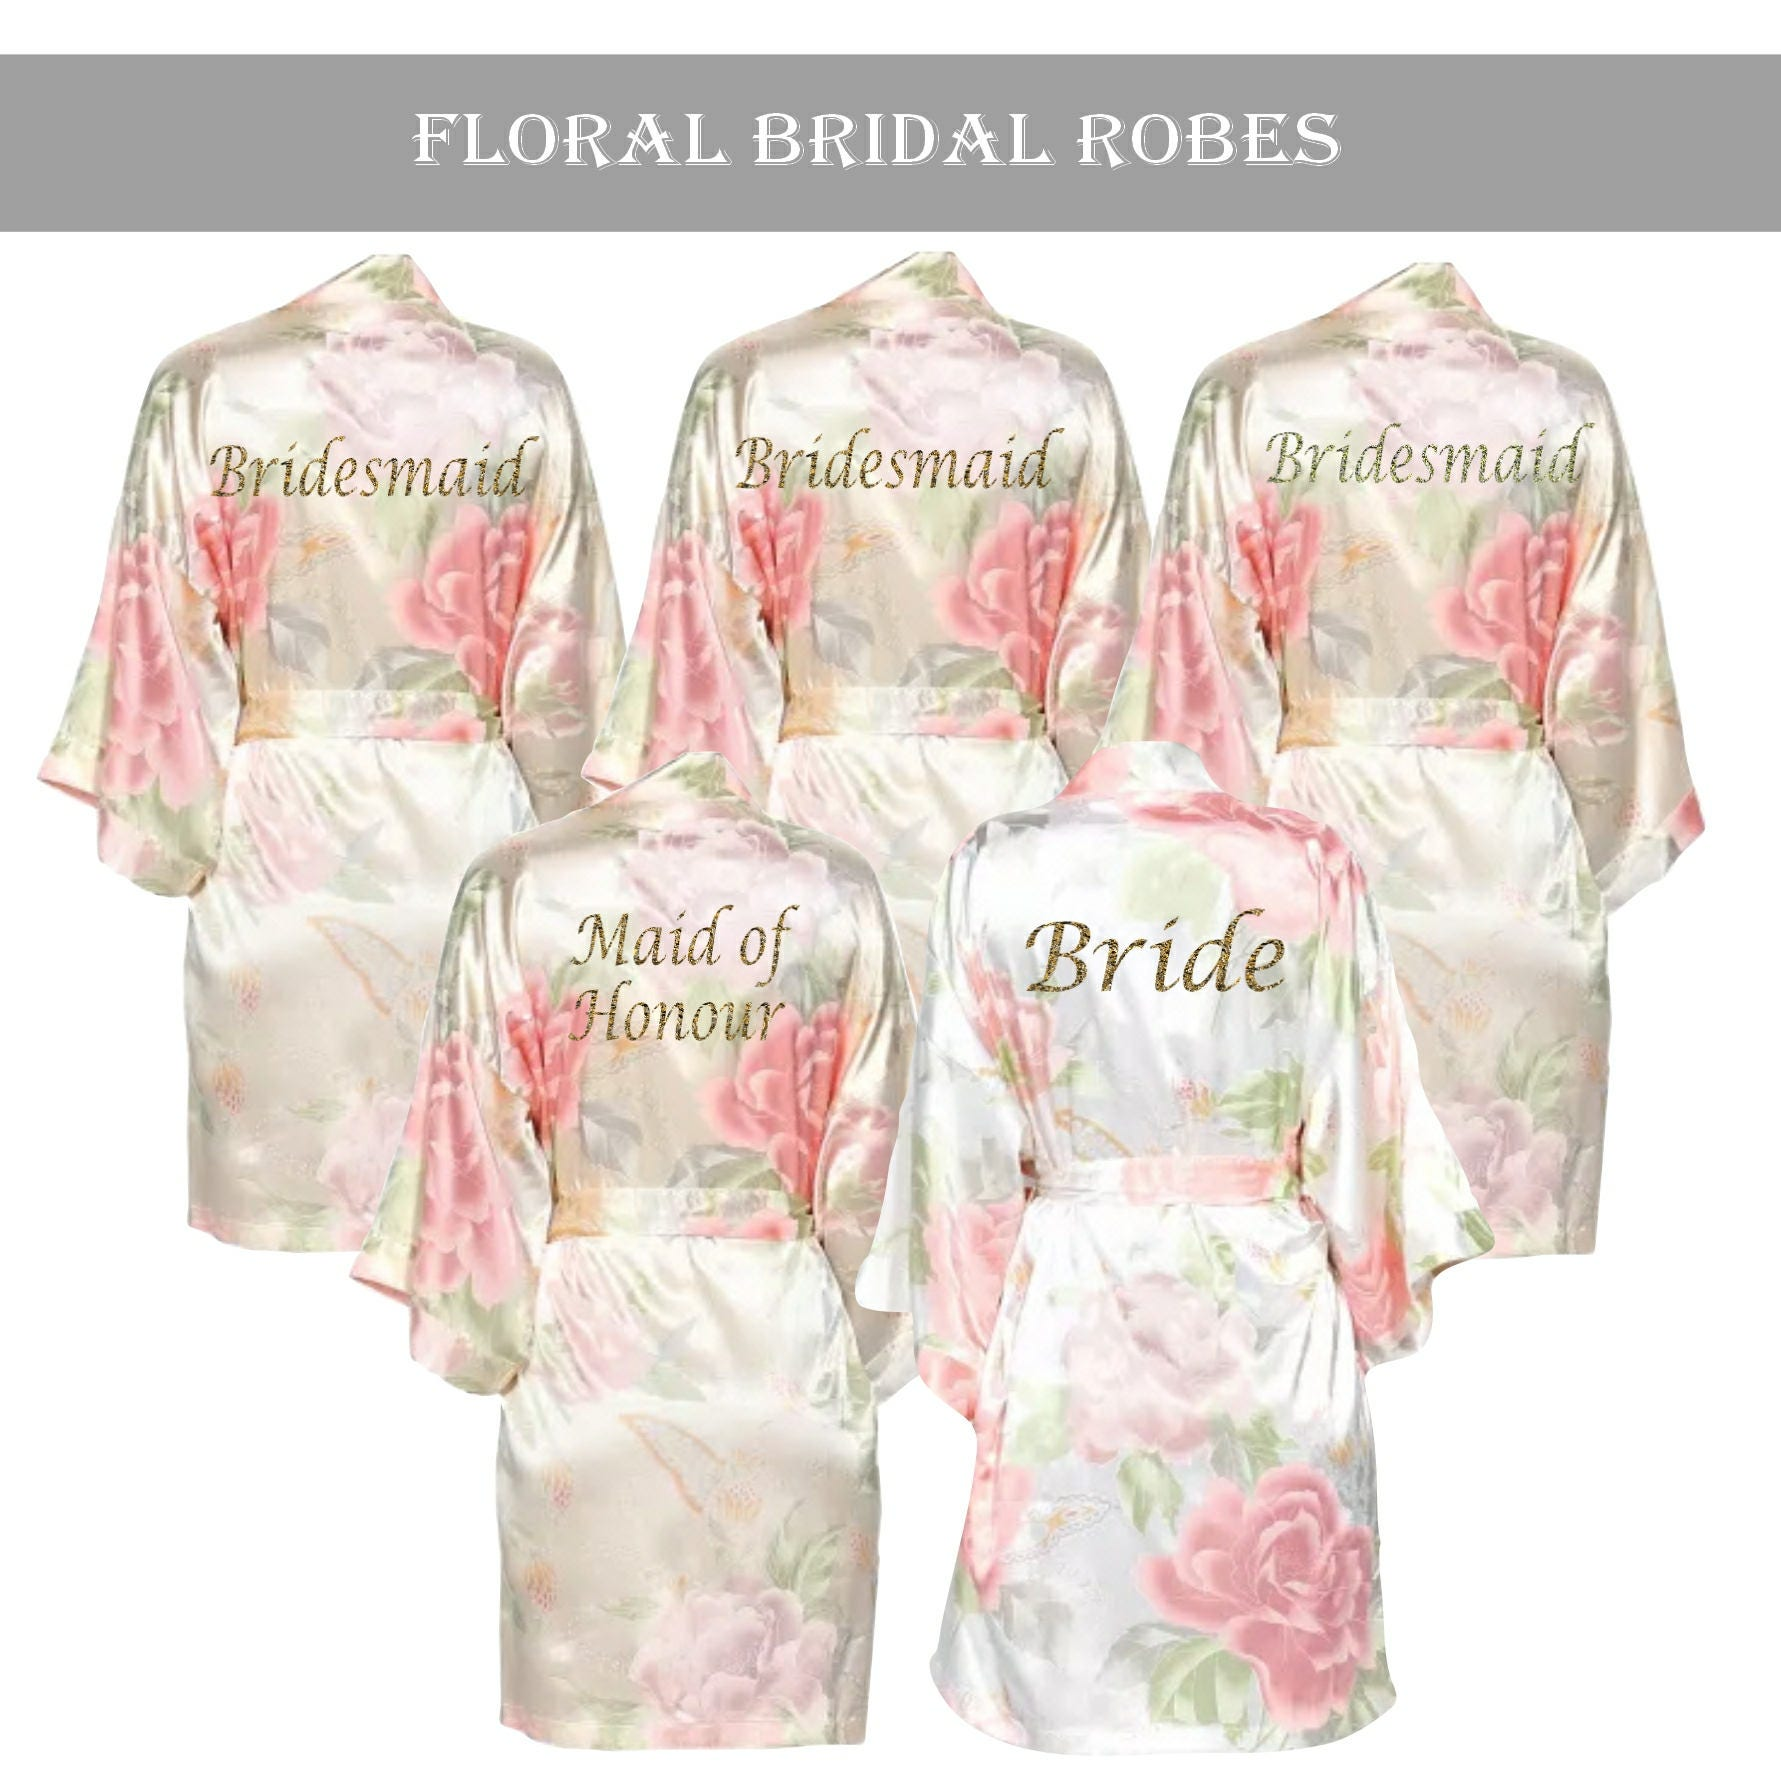 Personalised Vintage Floral Satin Bridal robe Champagne set. | Etsy